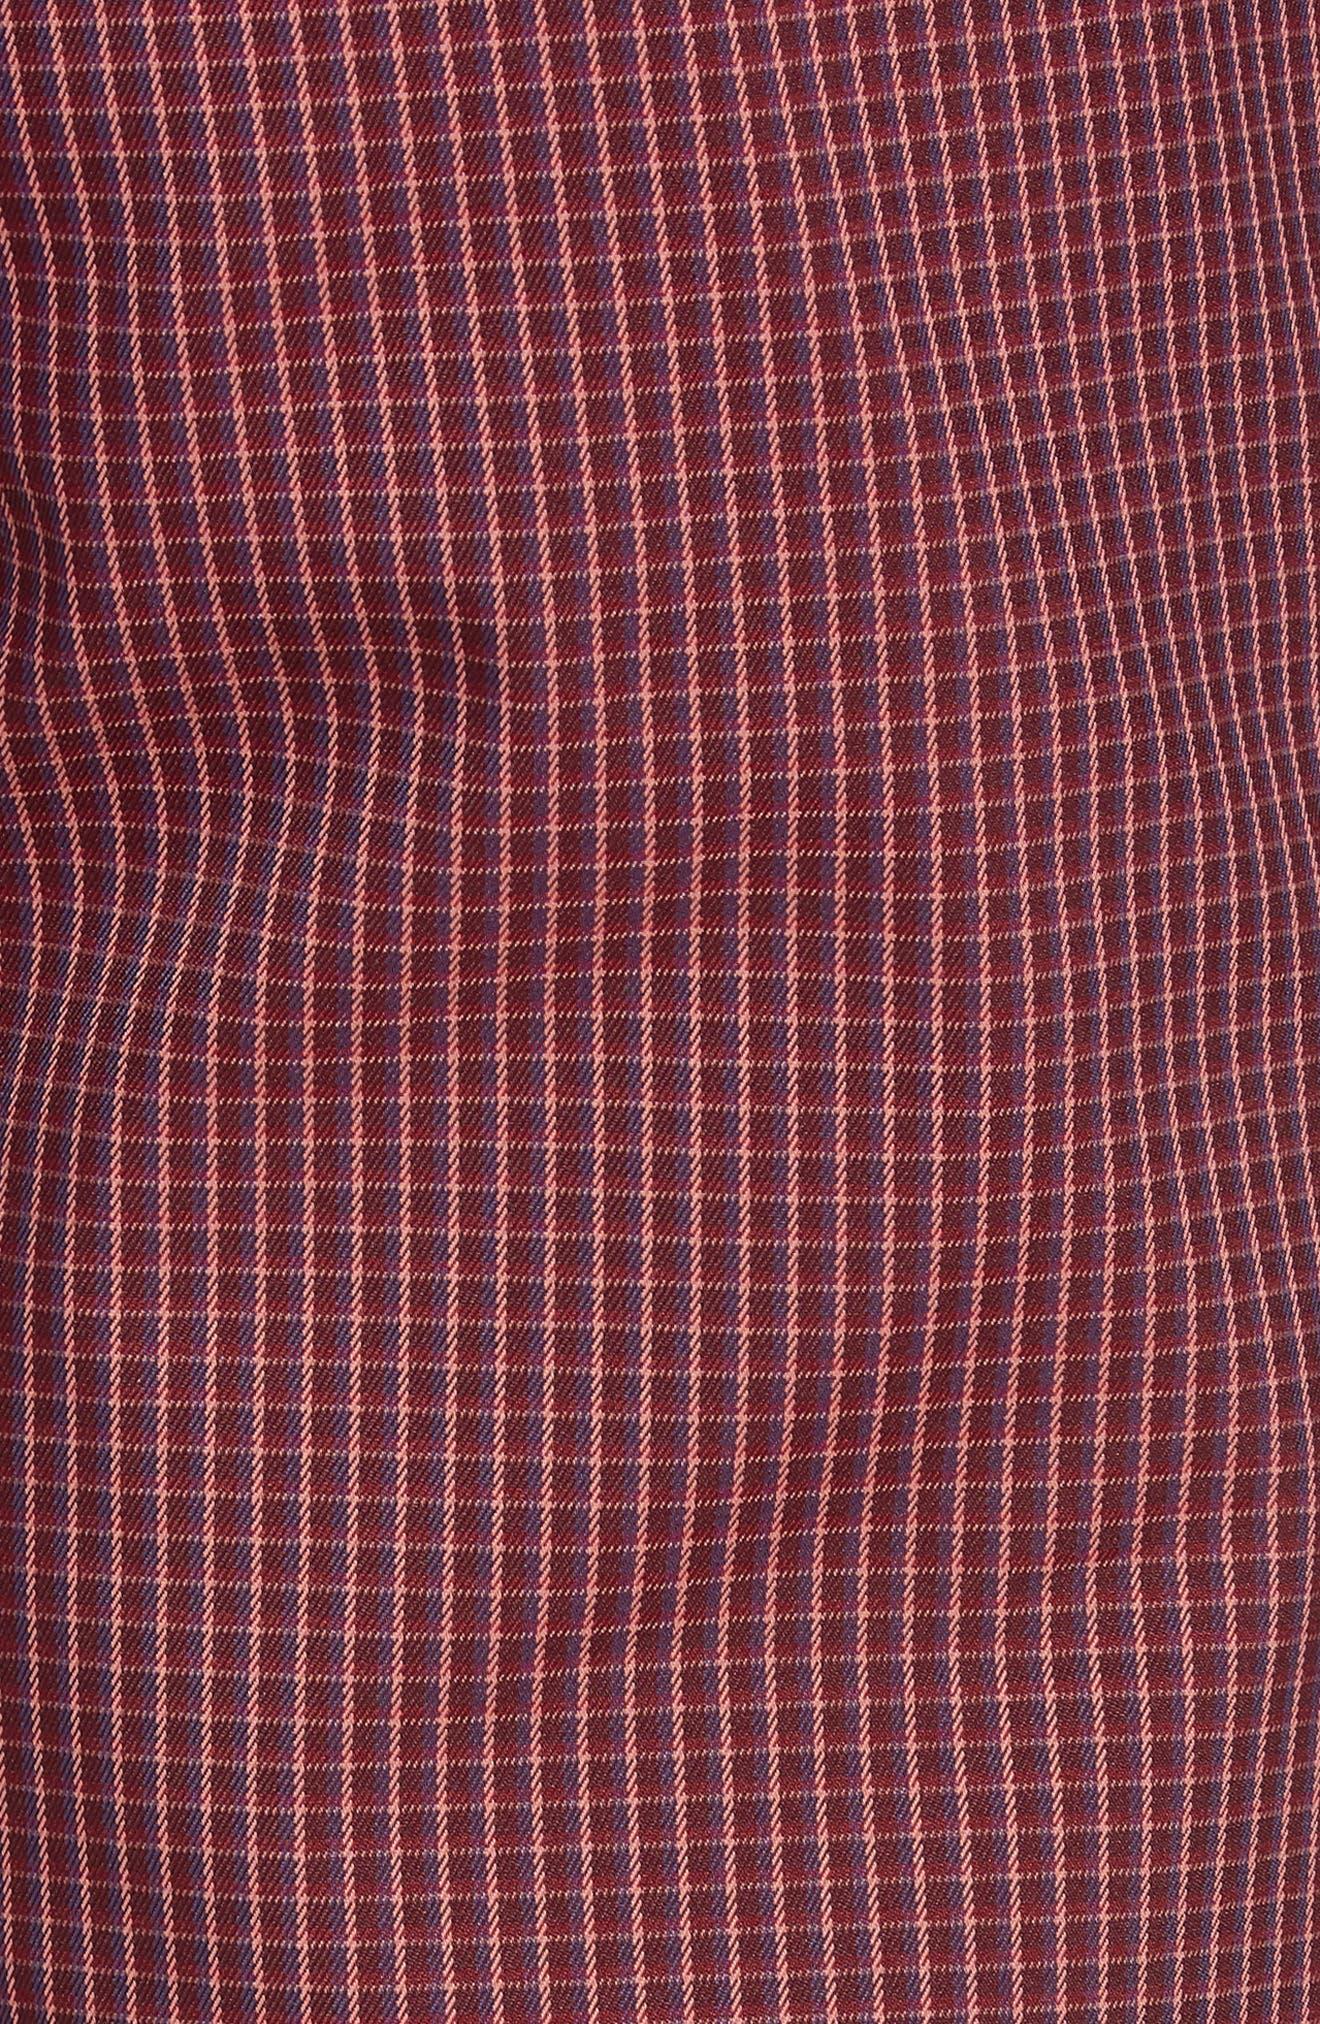 Highland Slim Fit Golf Pants,                             Alternate thumbnail 5, color,                             RED PLAID